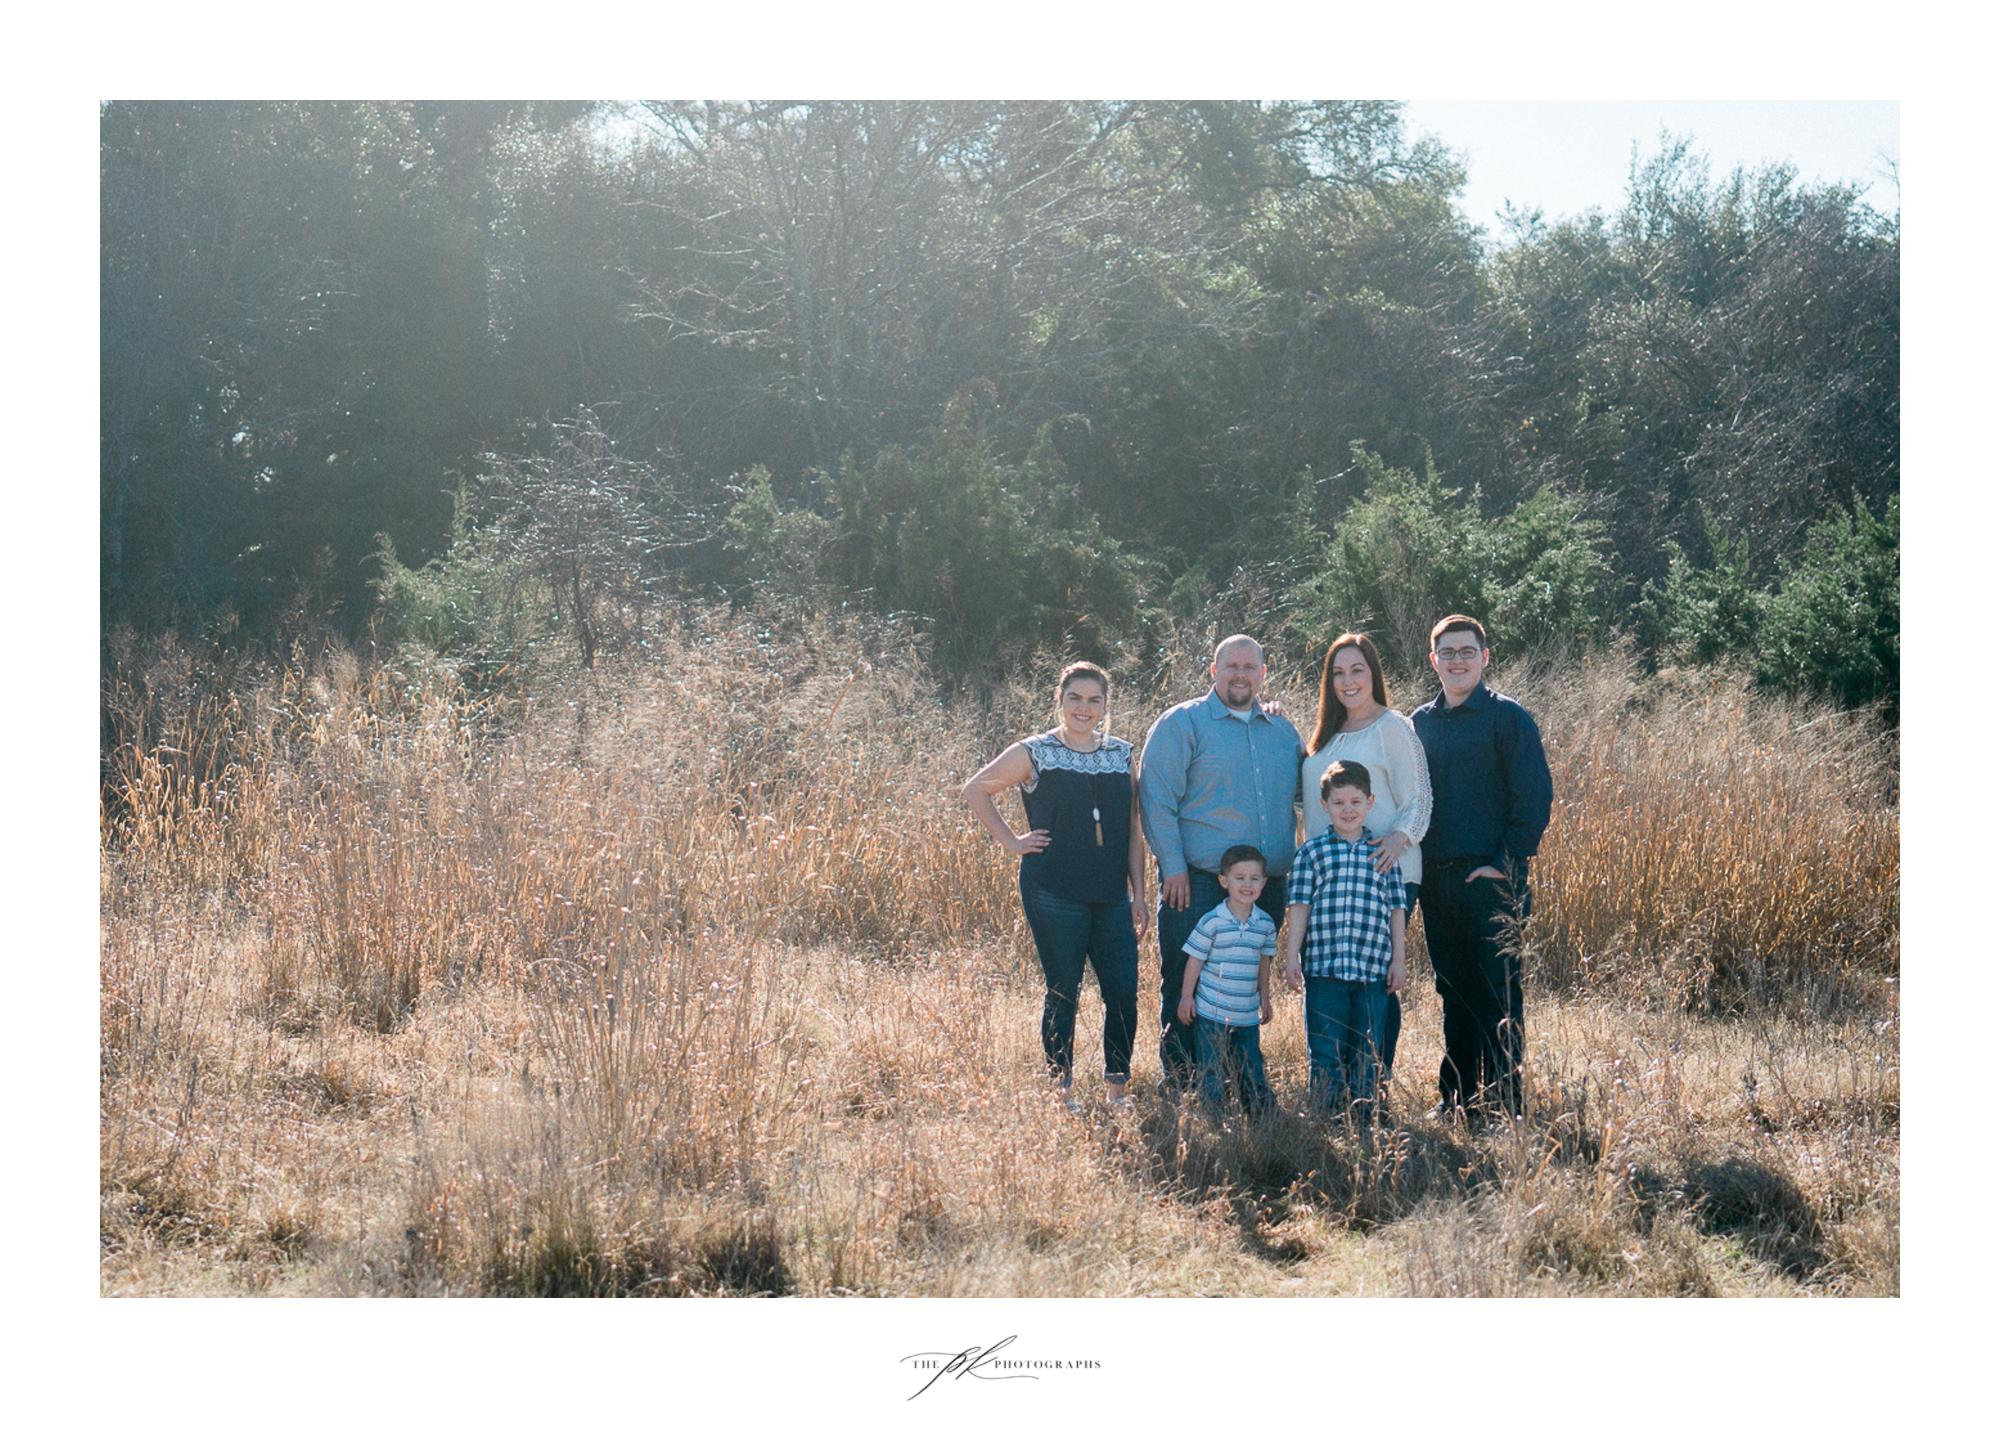 Family photoshoot at the Cibolo Nature Center, outside of San Antonio, Texas.